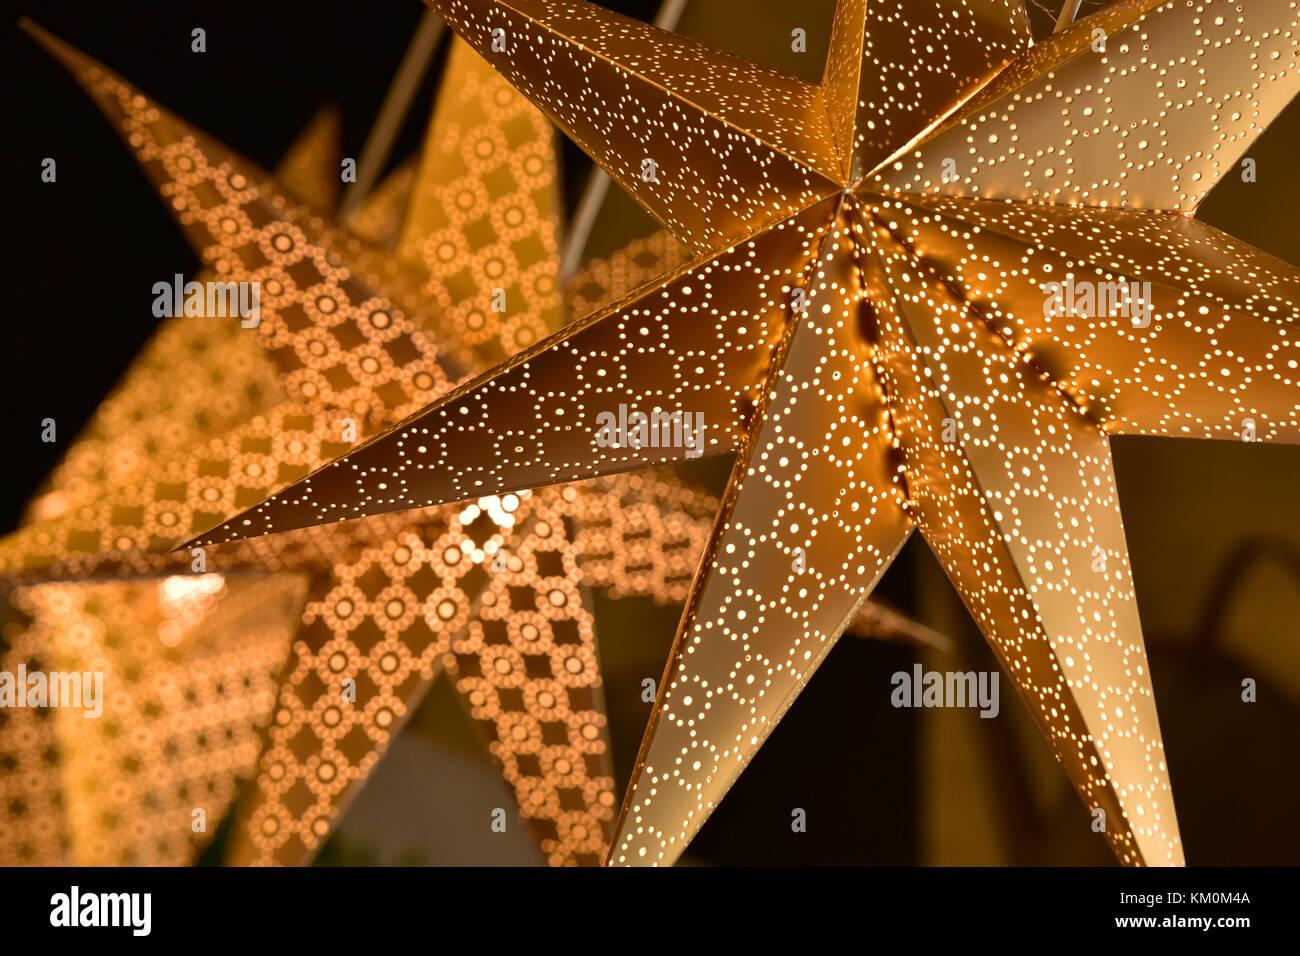 golden coloured christmas star decorations illuminated to celebrate